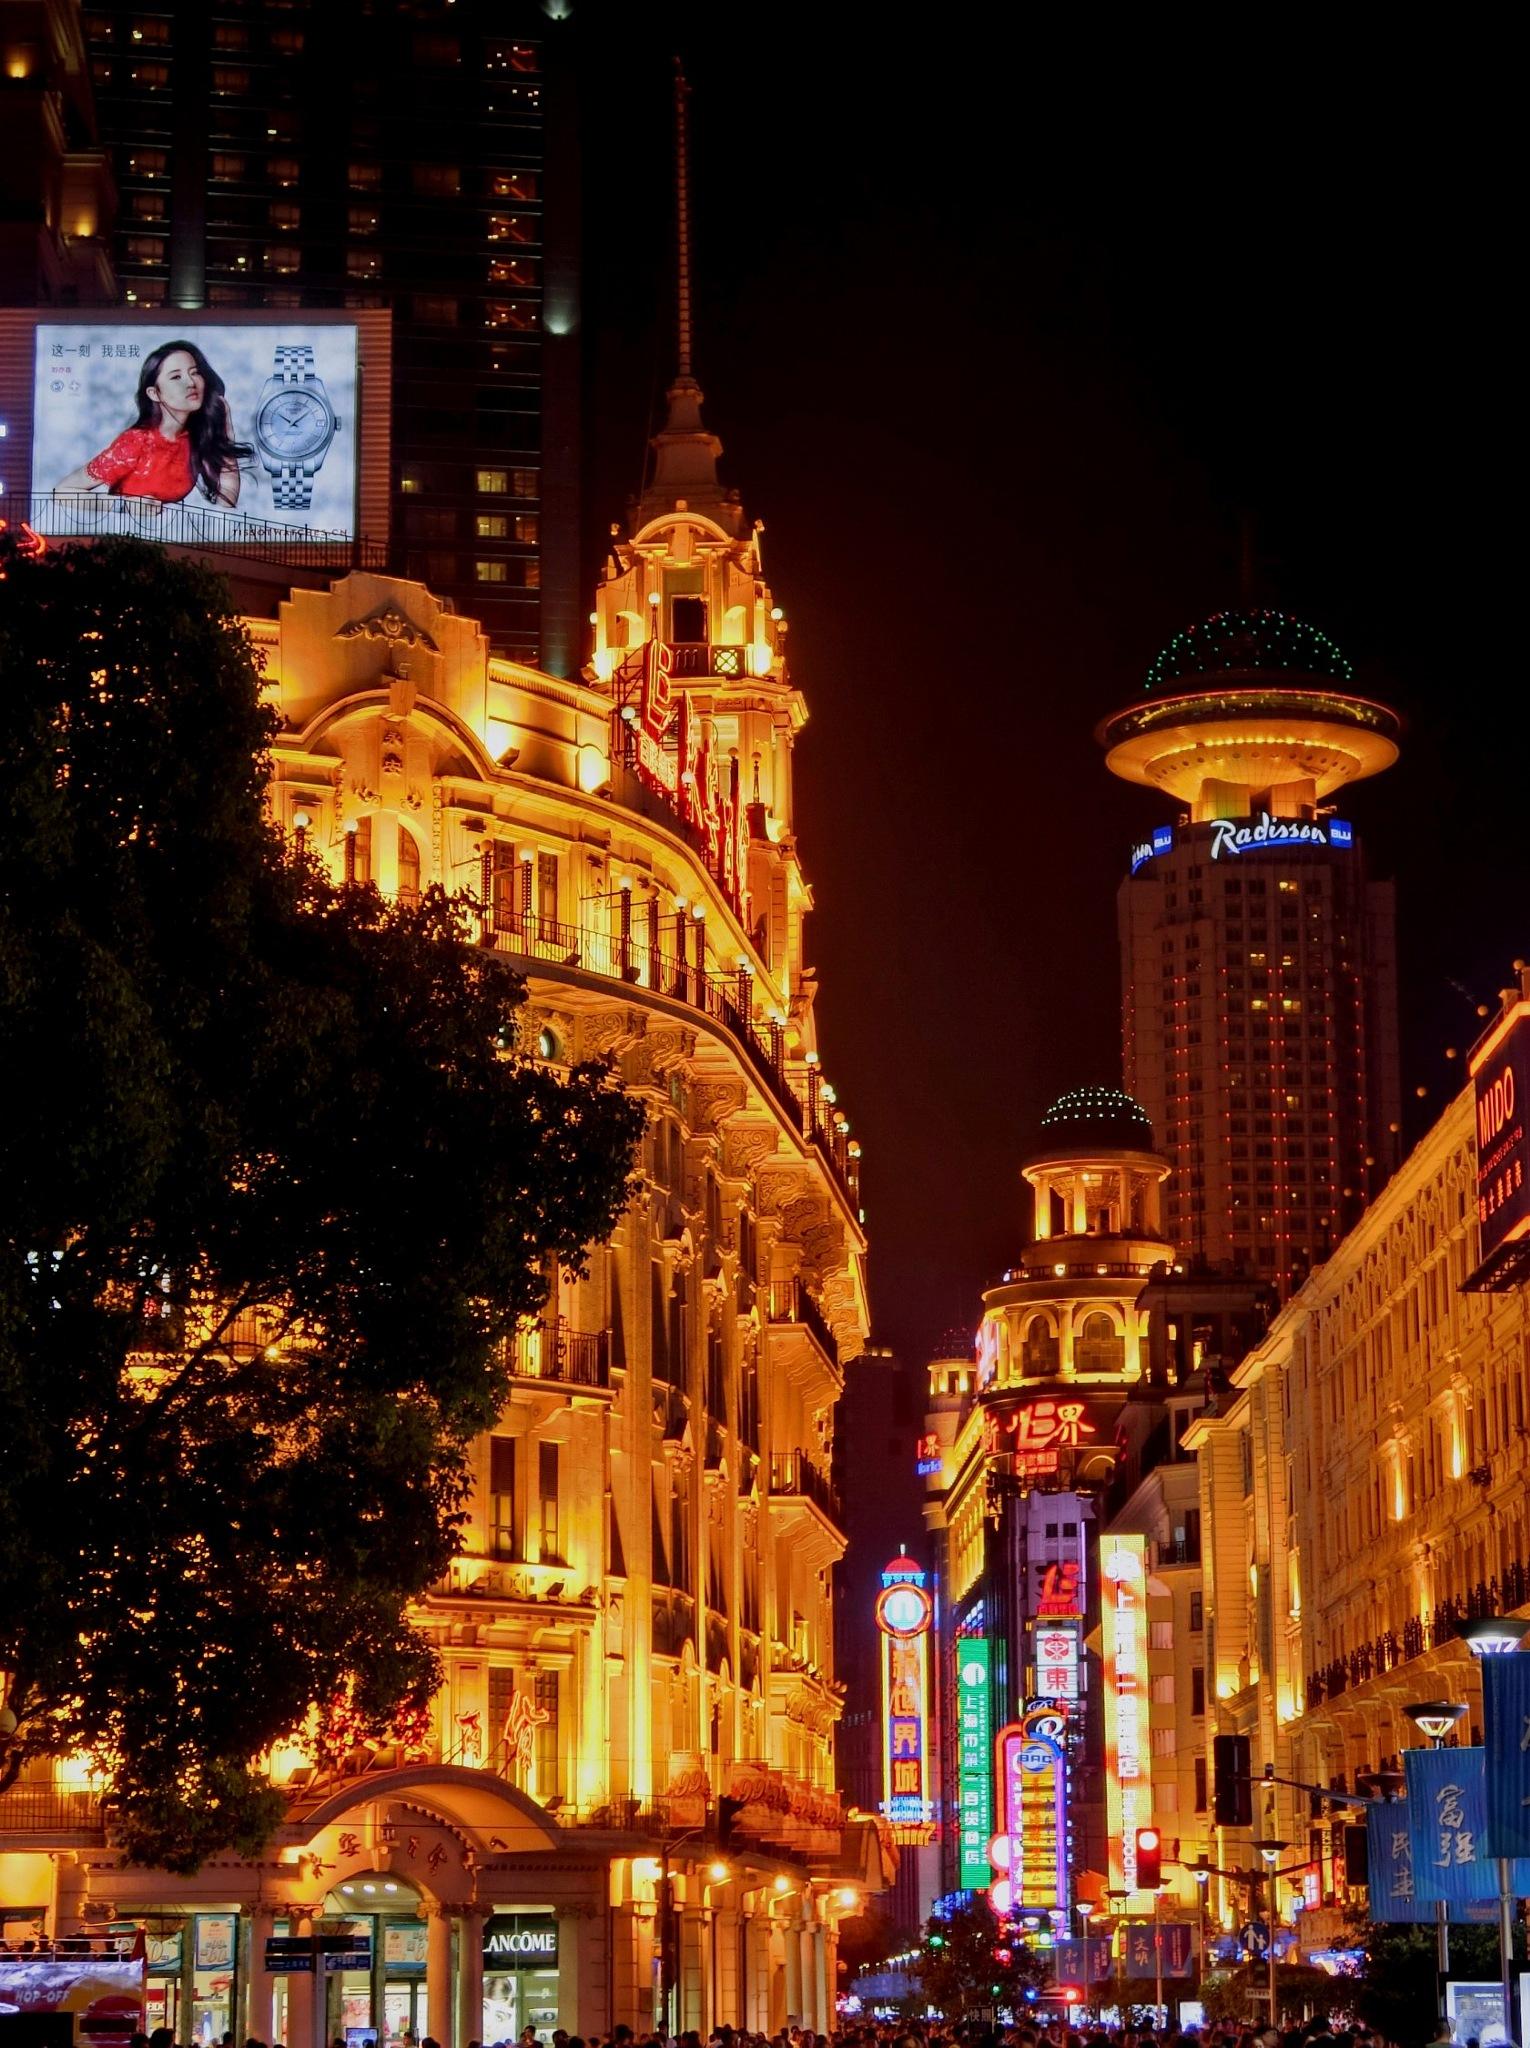 Nanjing Road, Shanghai-3 by pop88123